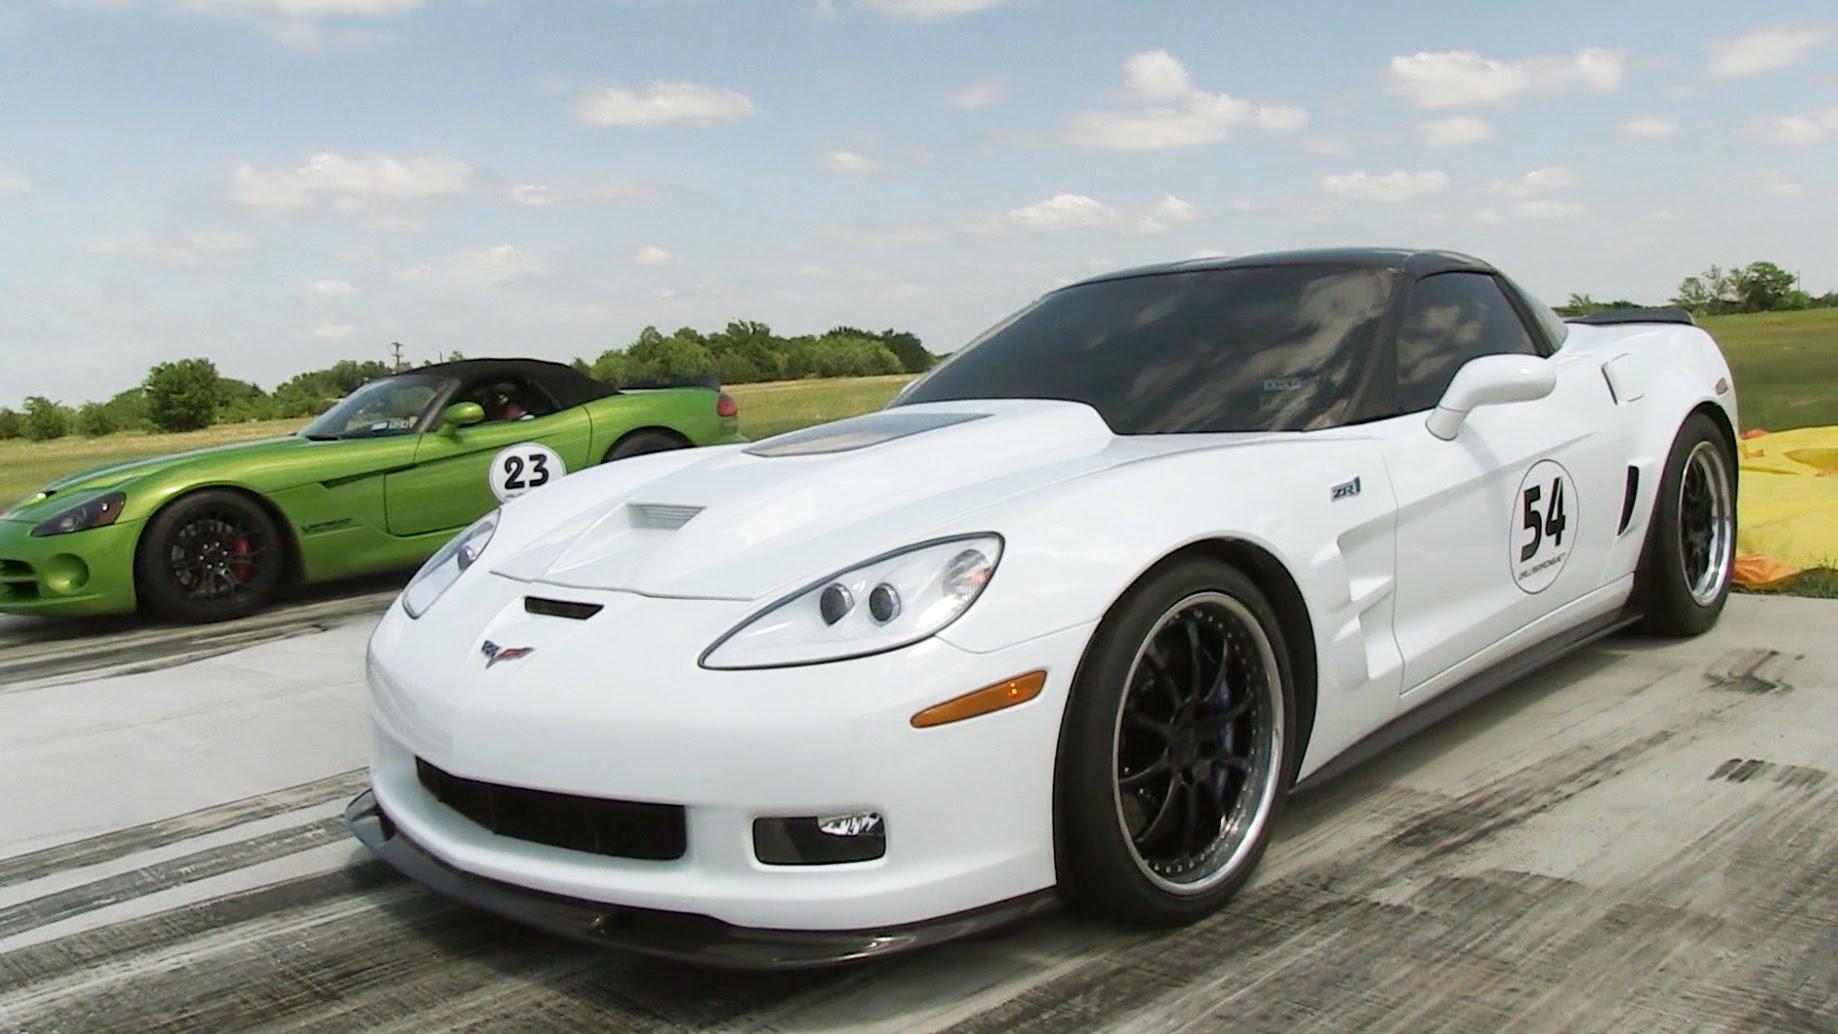 Watch A 1000 Horsepower Corvette ZR1 Embarrass Everything It Lines Up Against